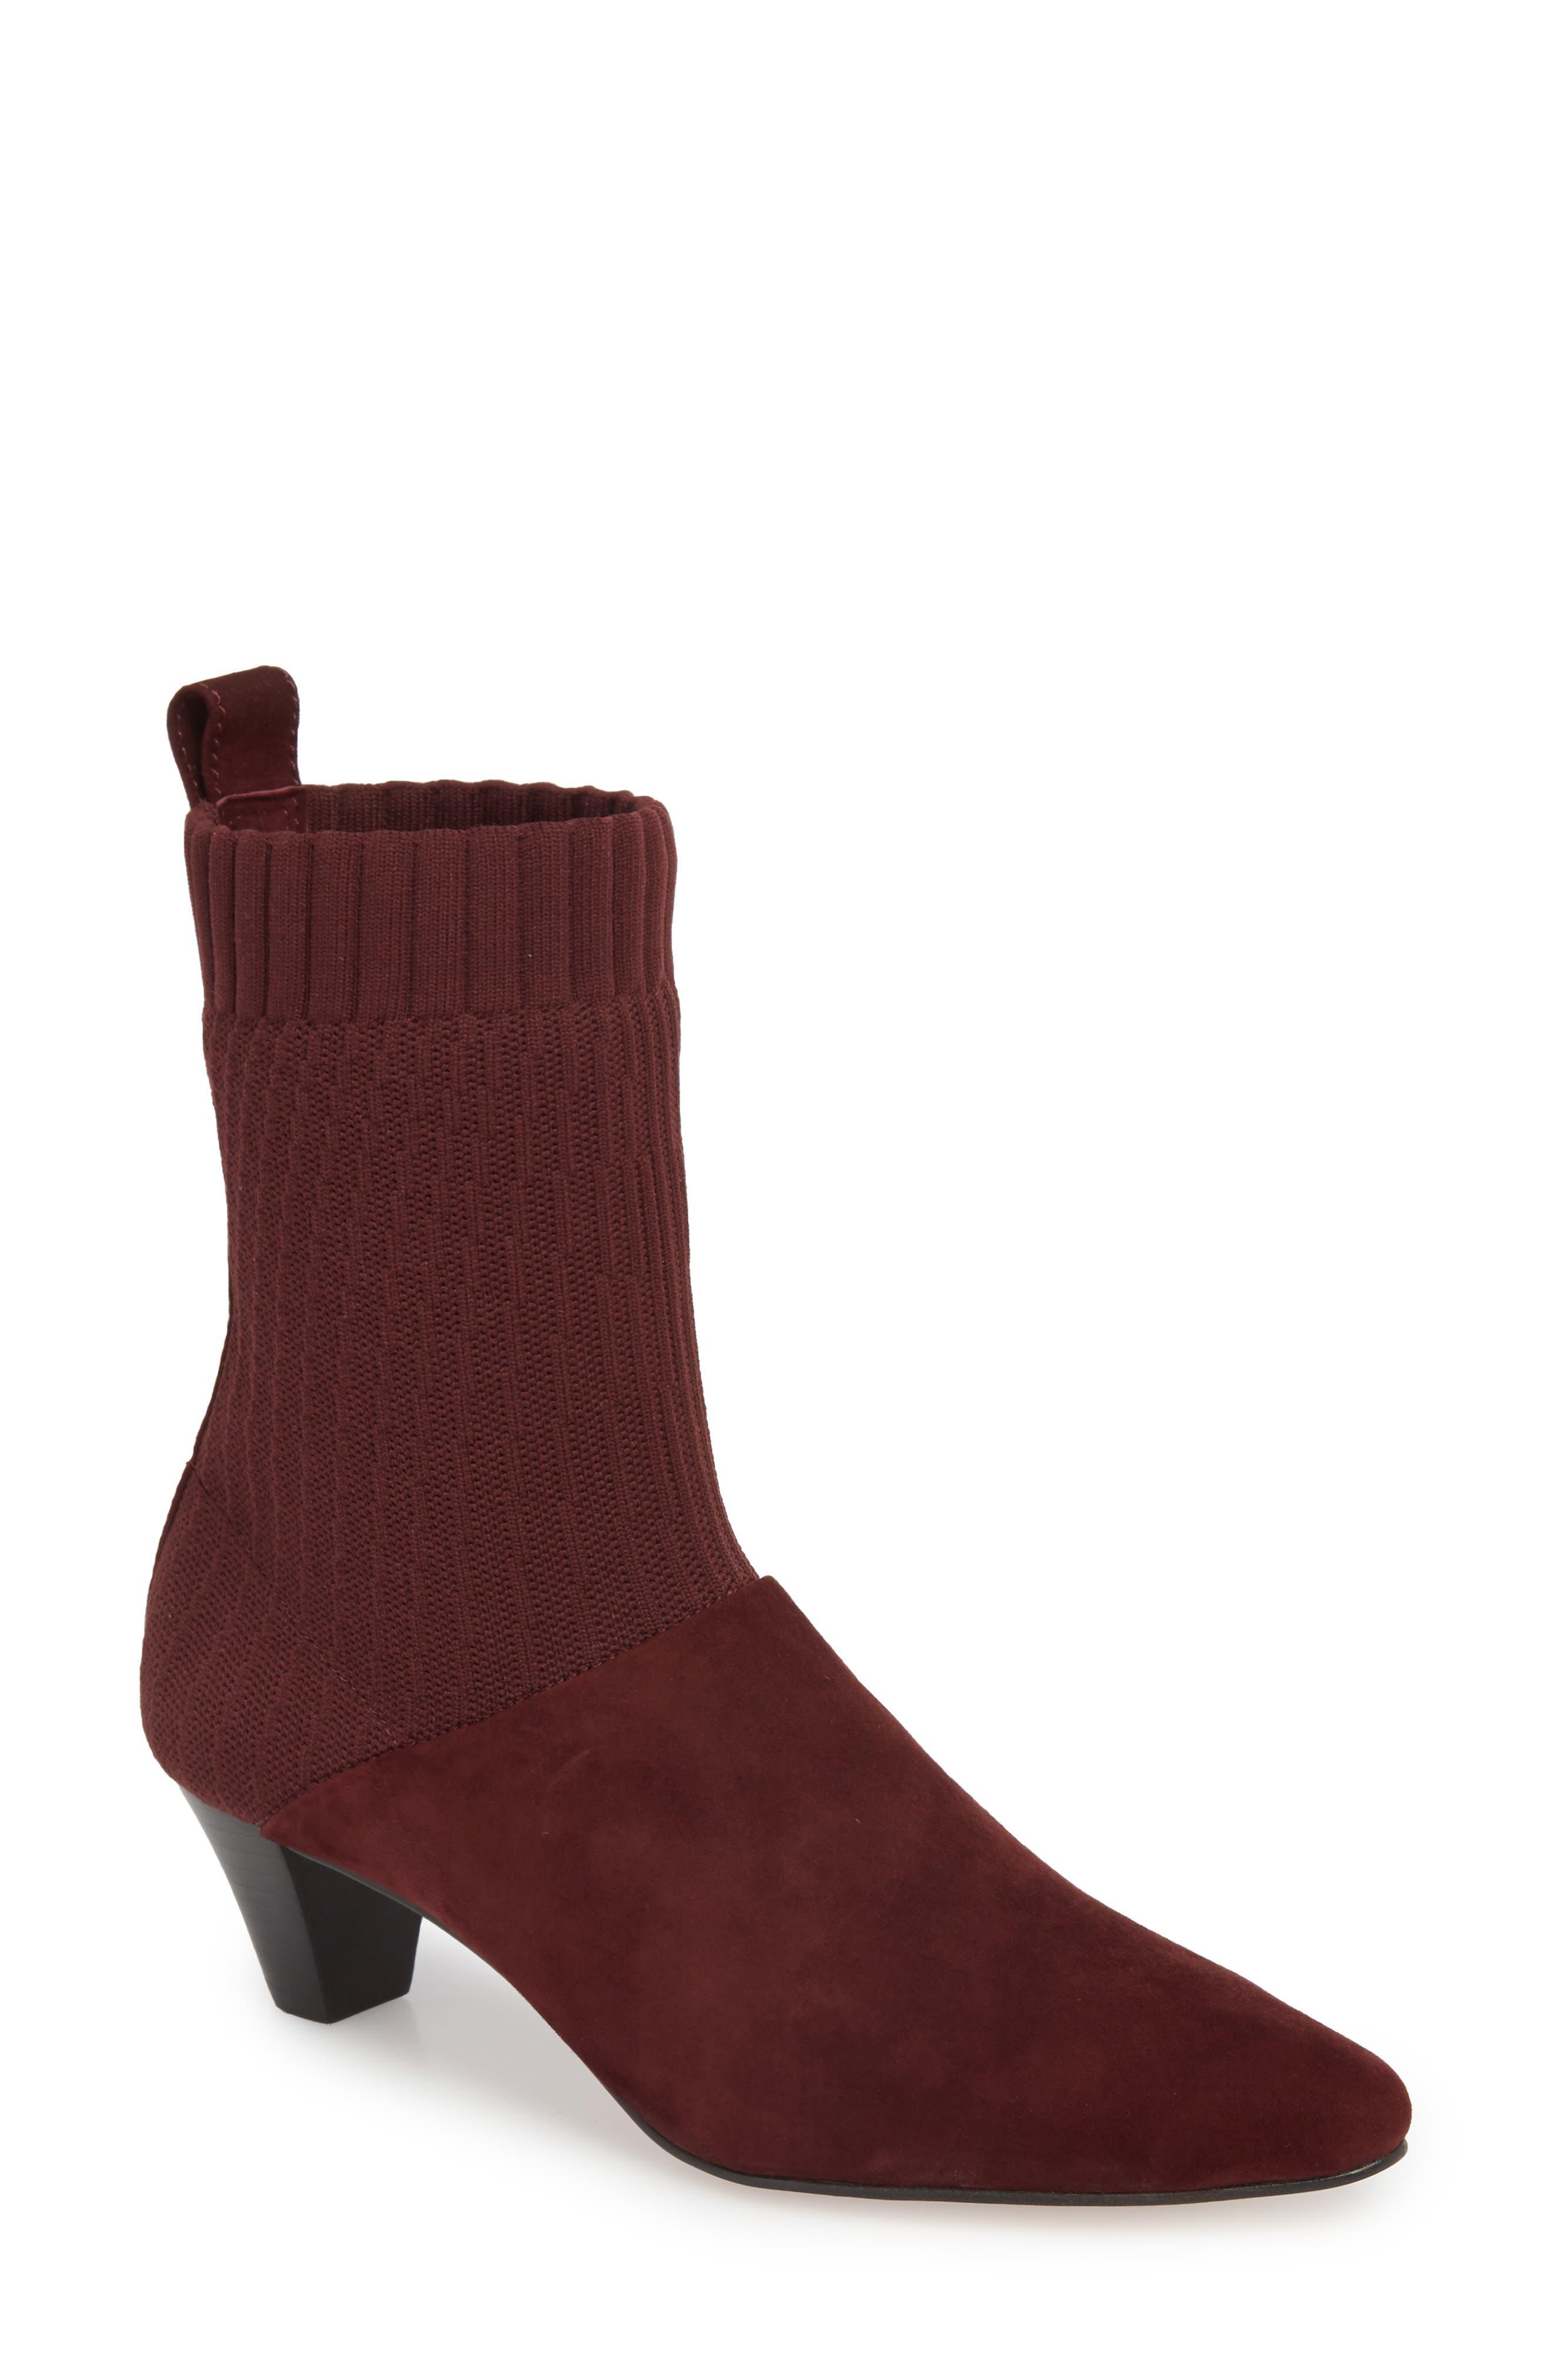 Nuria Sock Bootie,                             Main thumbnail 1, color,                             Deep Plum Suede